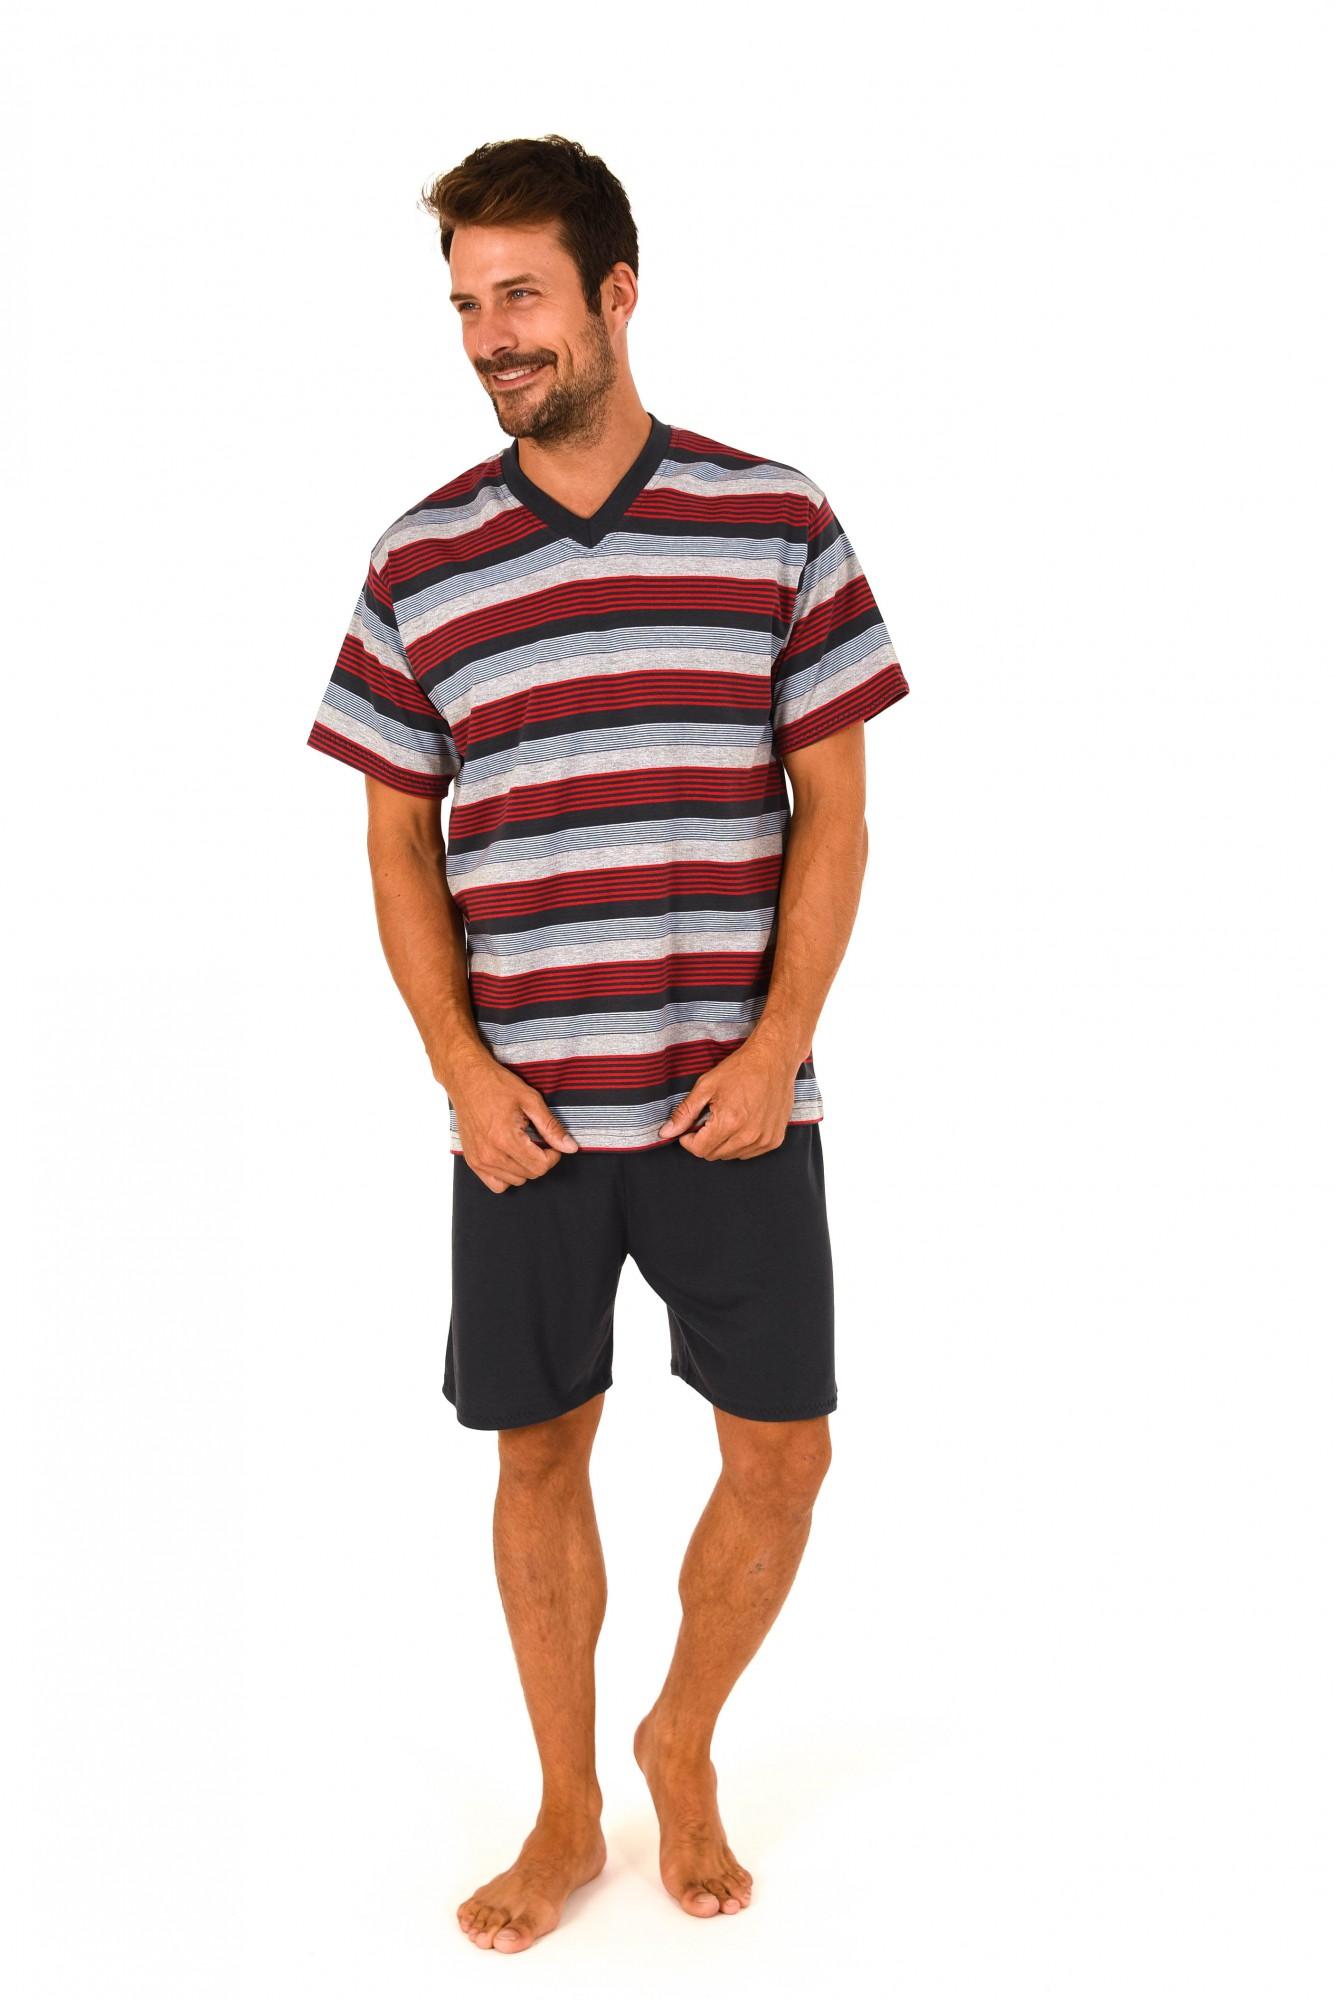 Herren Pyjama Shorty kurzarm gestreift – 171 105 90 724